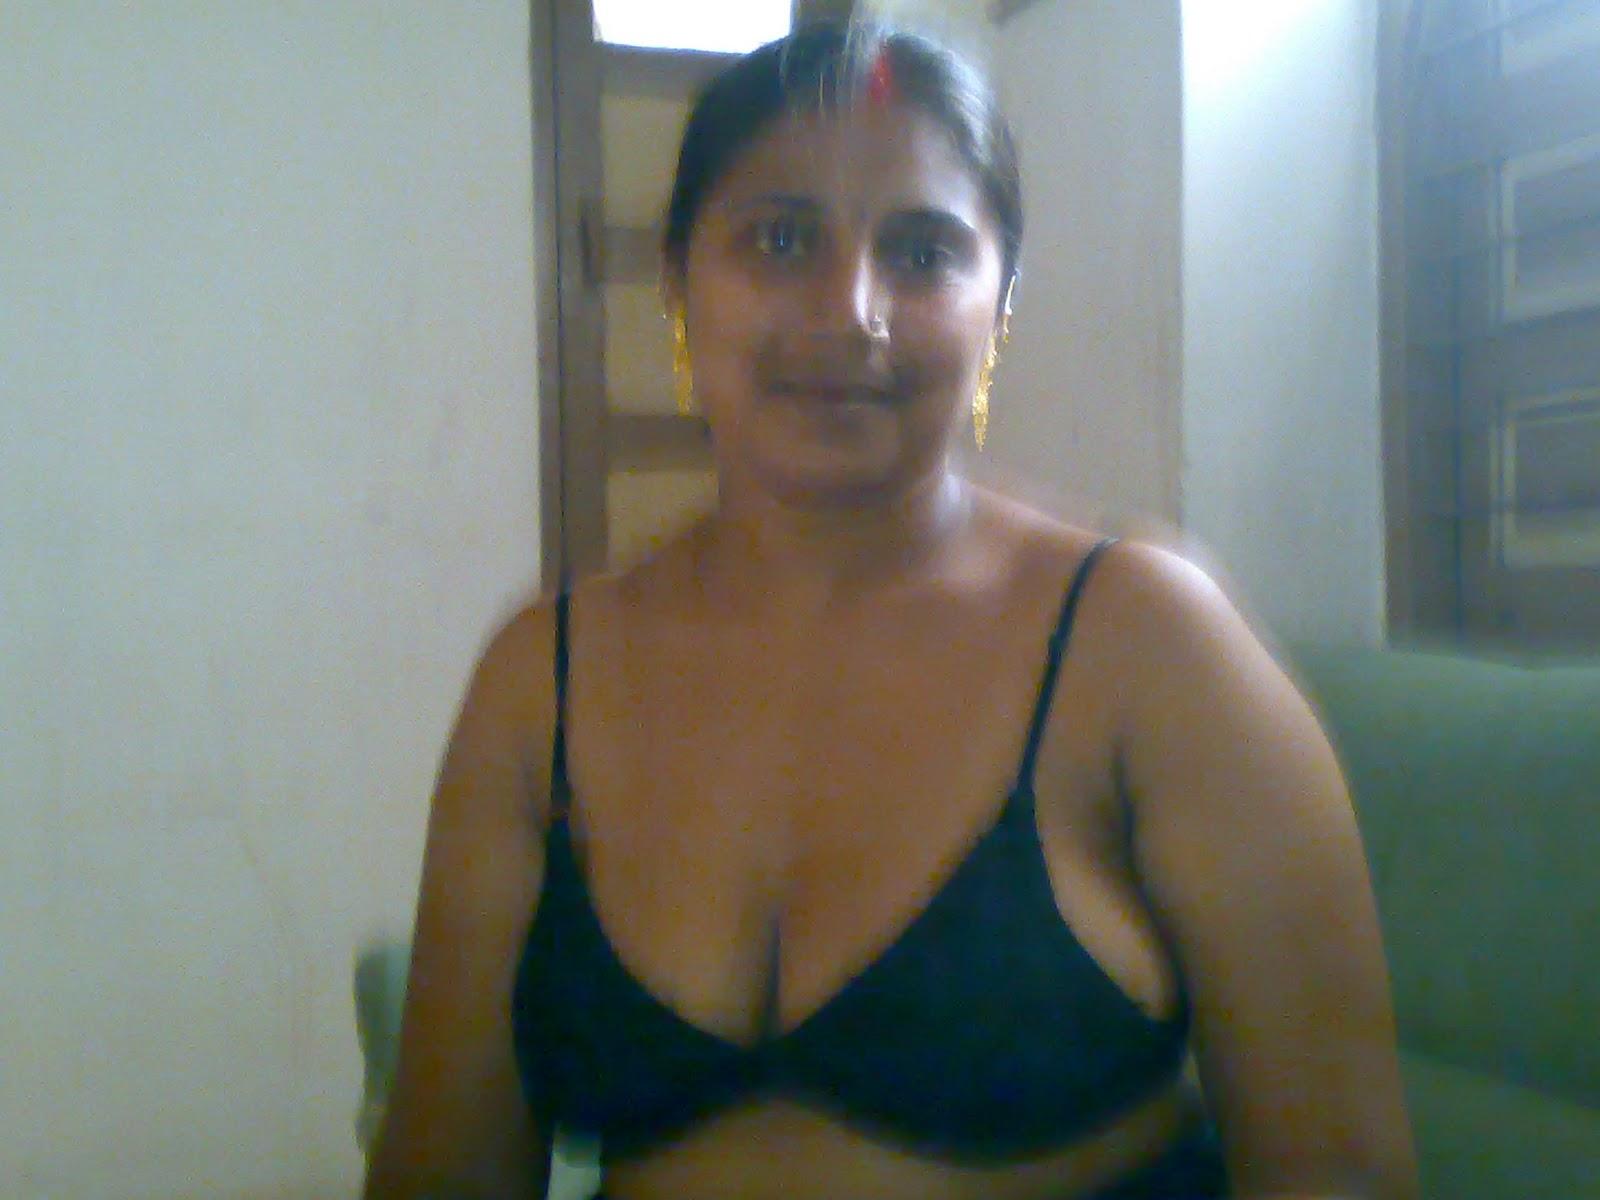 Mature asian women nude